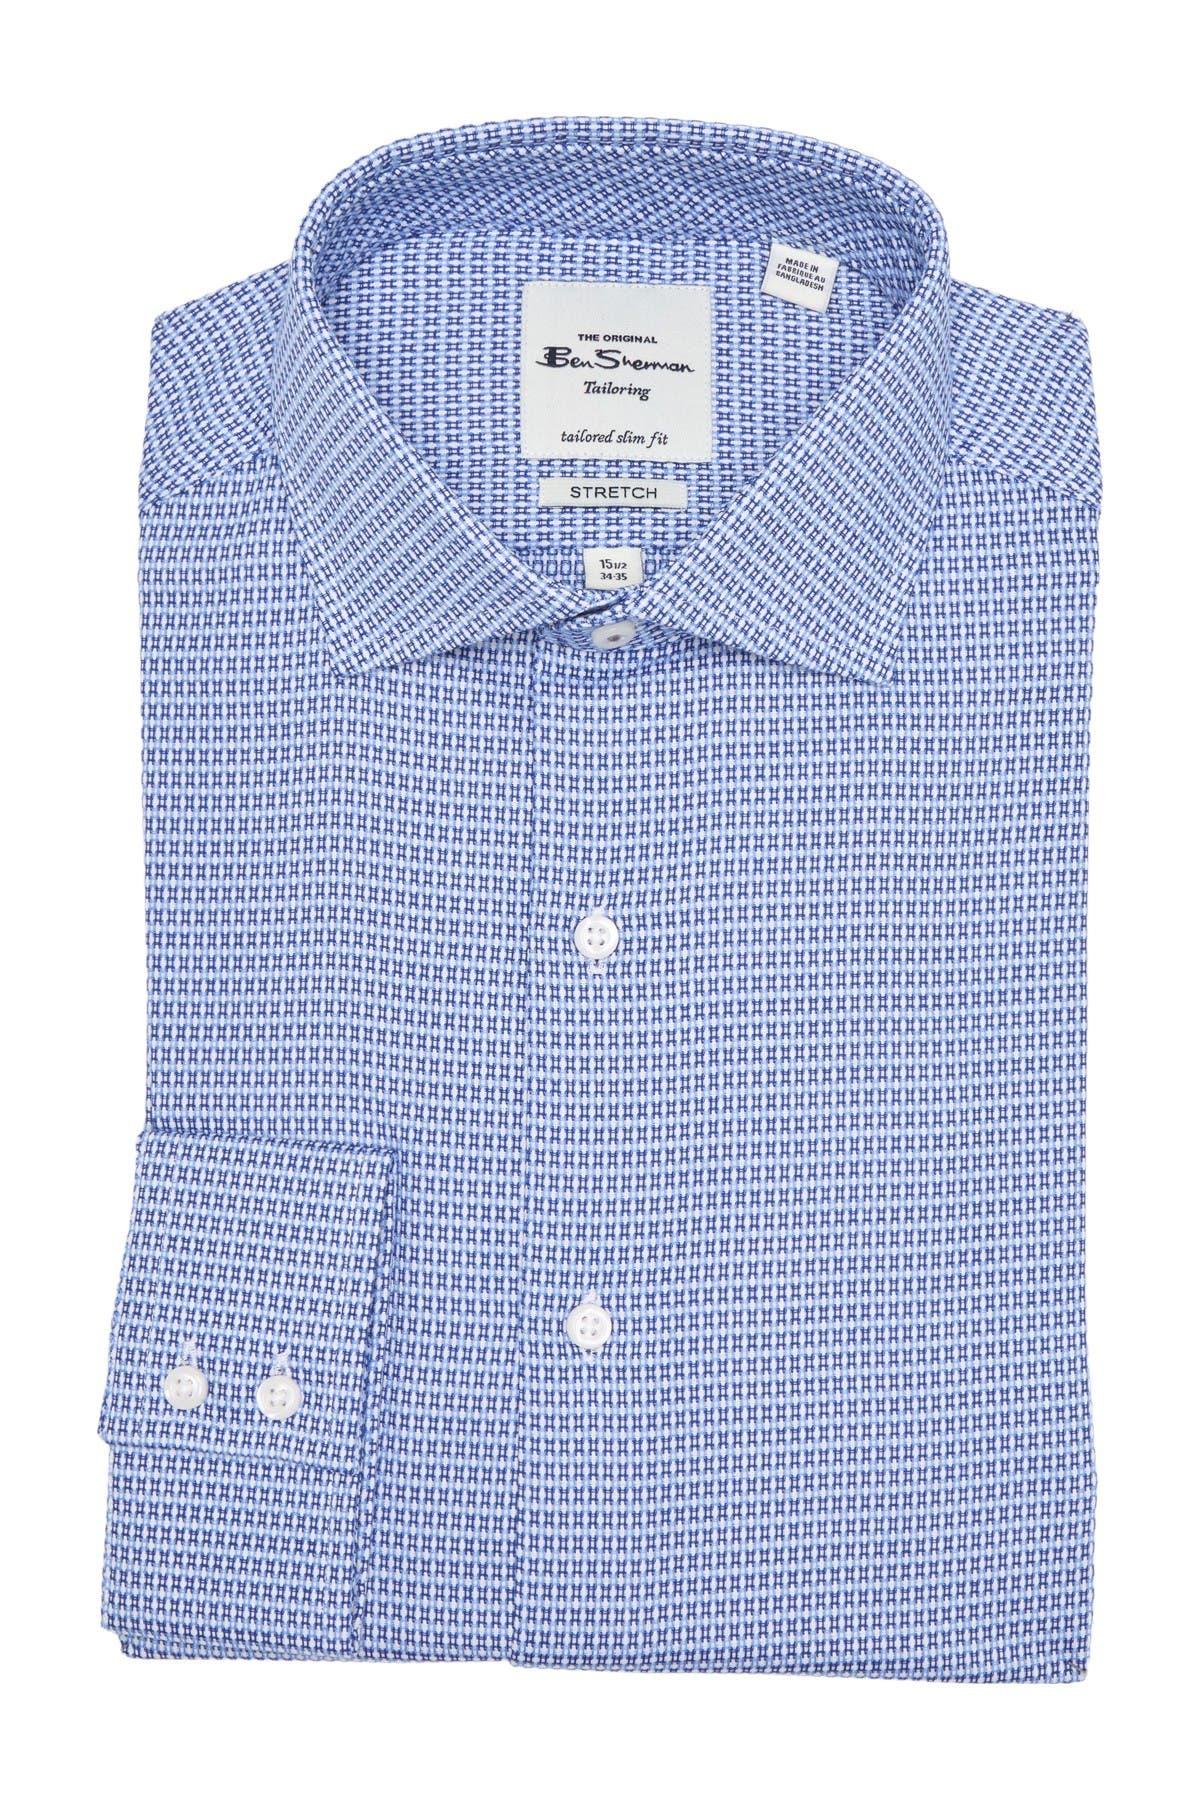 Image of Ben Sherman Blue & Royal Dobby Unsolid Slim Fit Dress Shirt